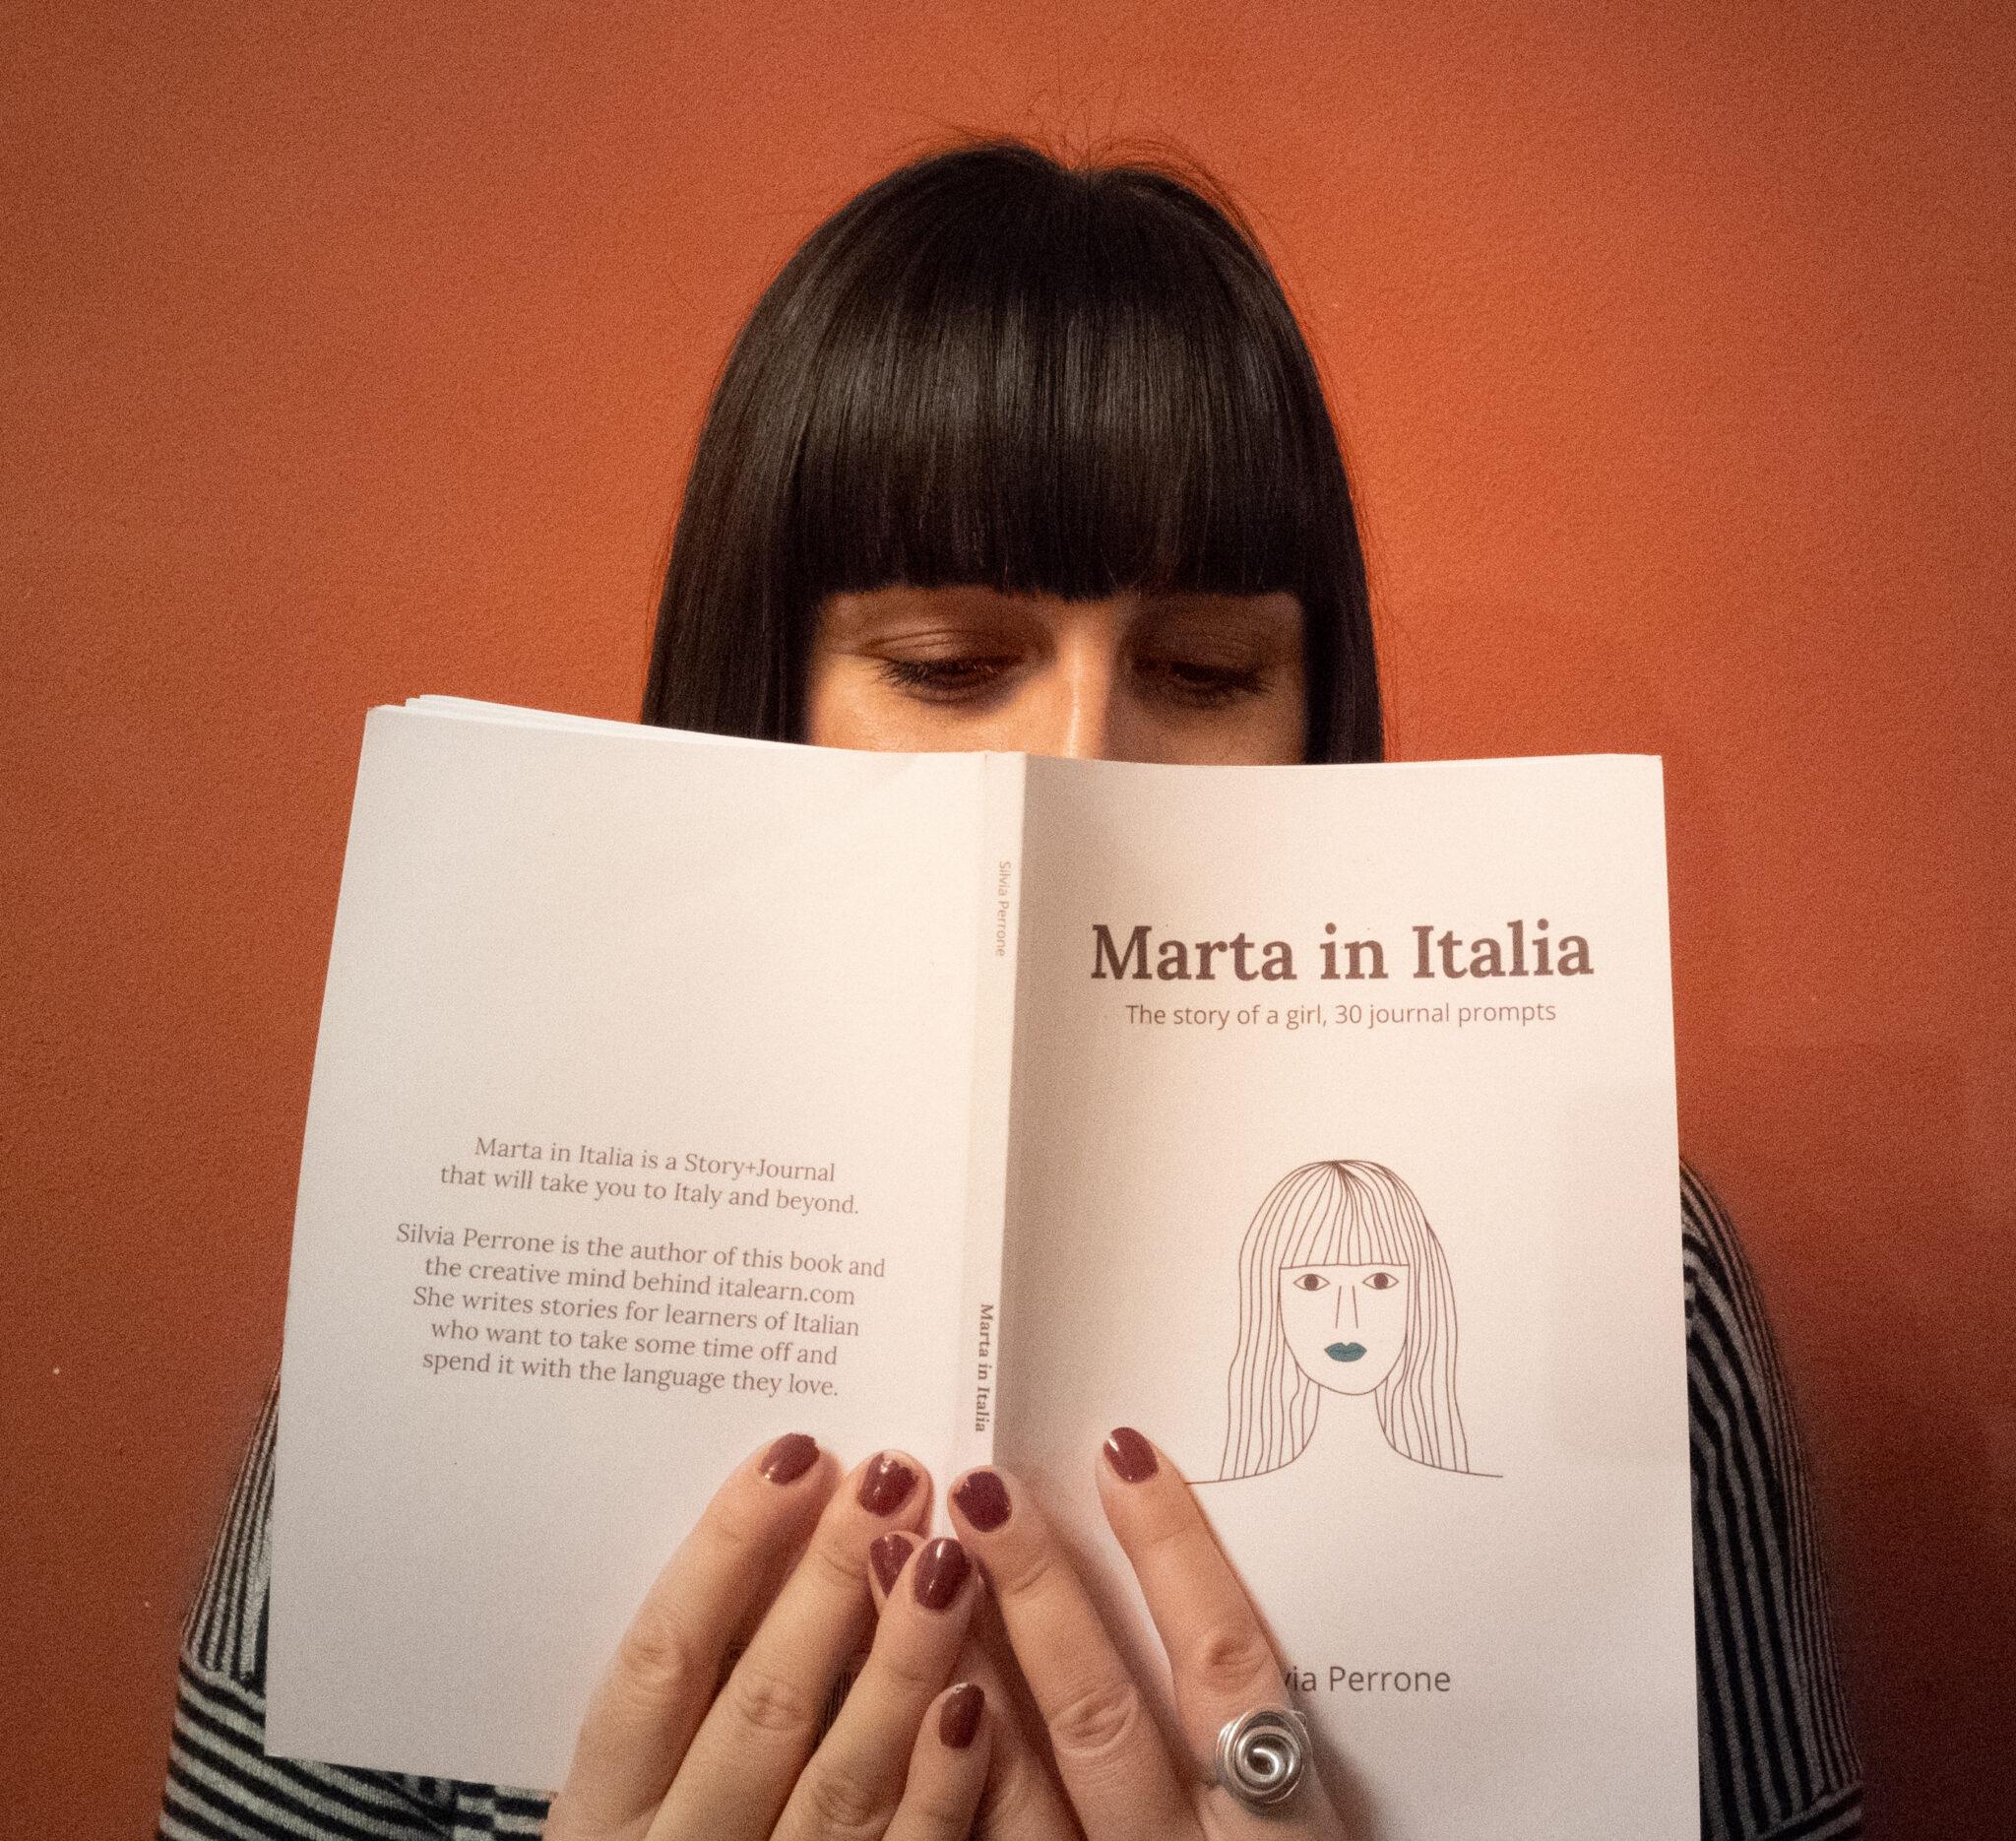 Silvia Perrone - Author, Language Coach, Podcaster - Italearn.com